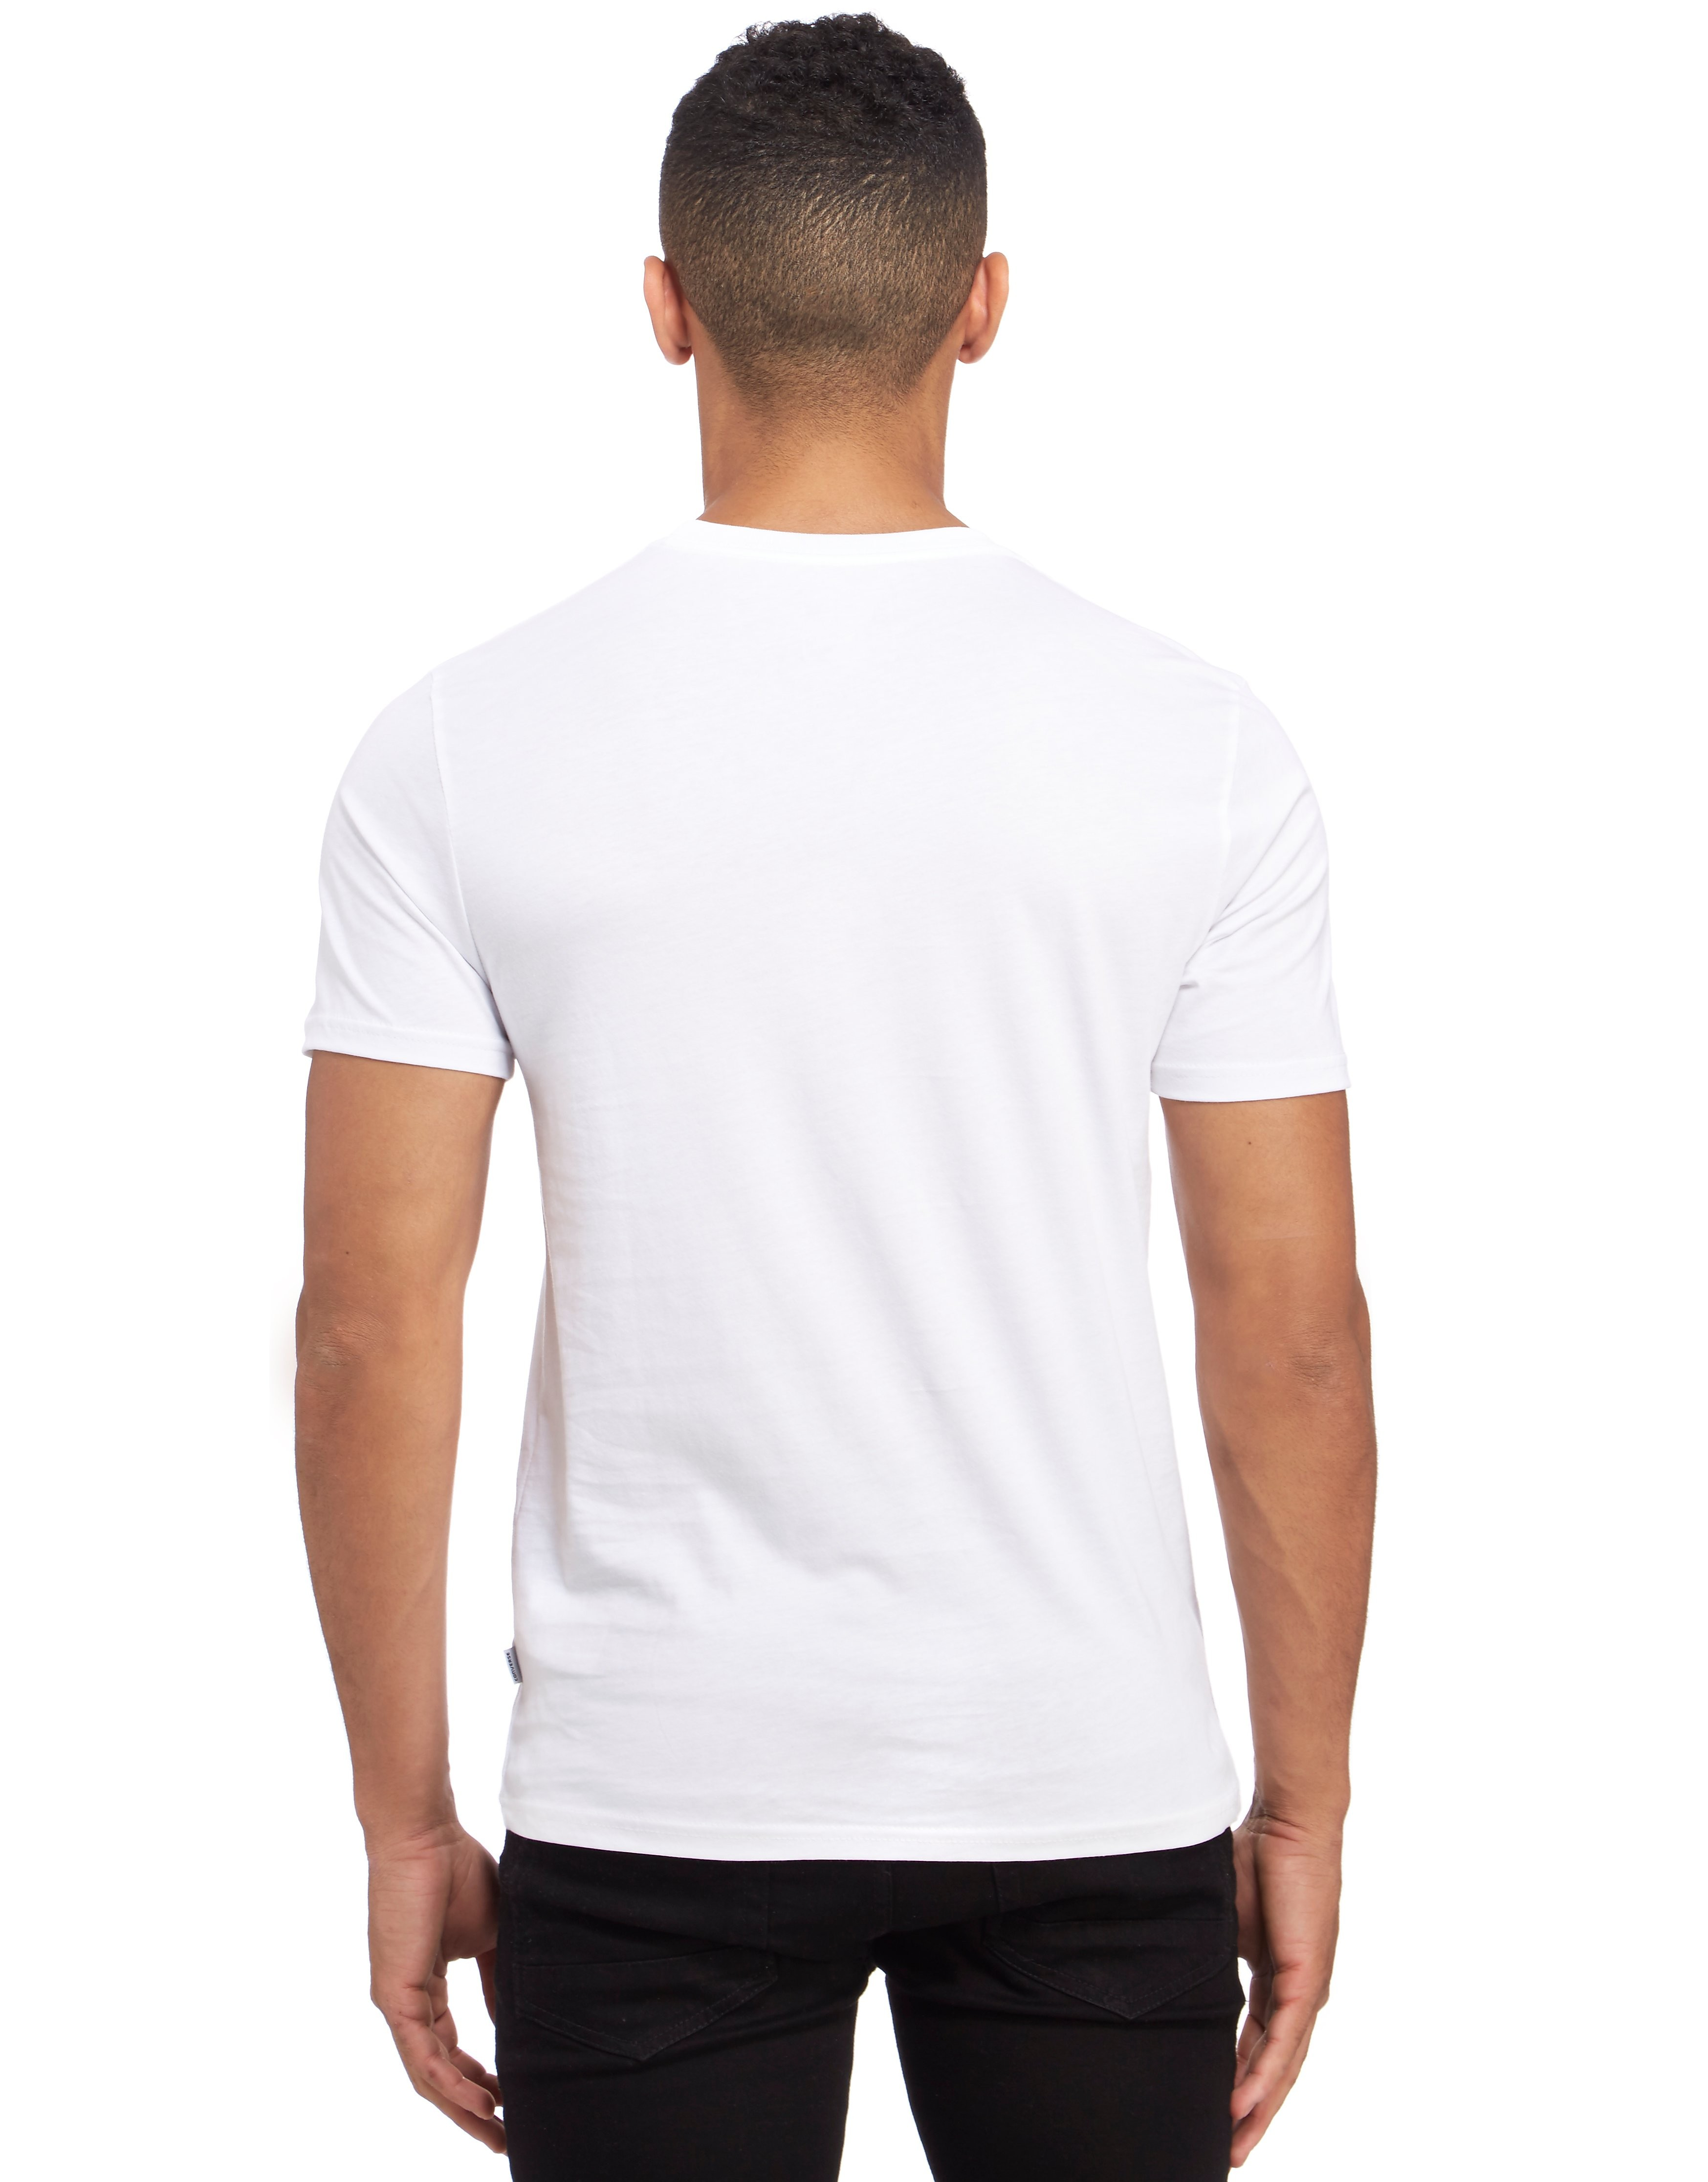 Converse T-shirt avec petit logo Chuck